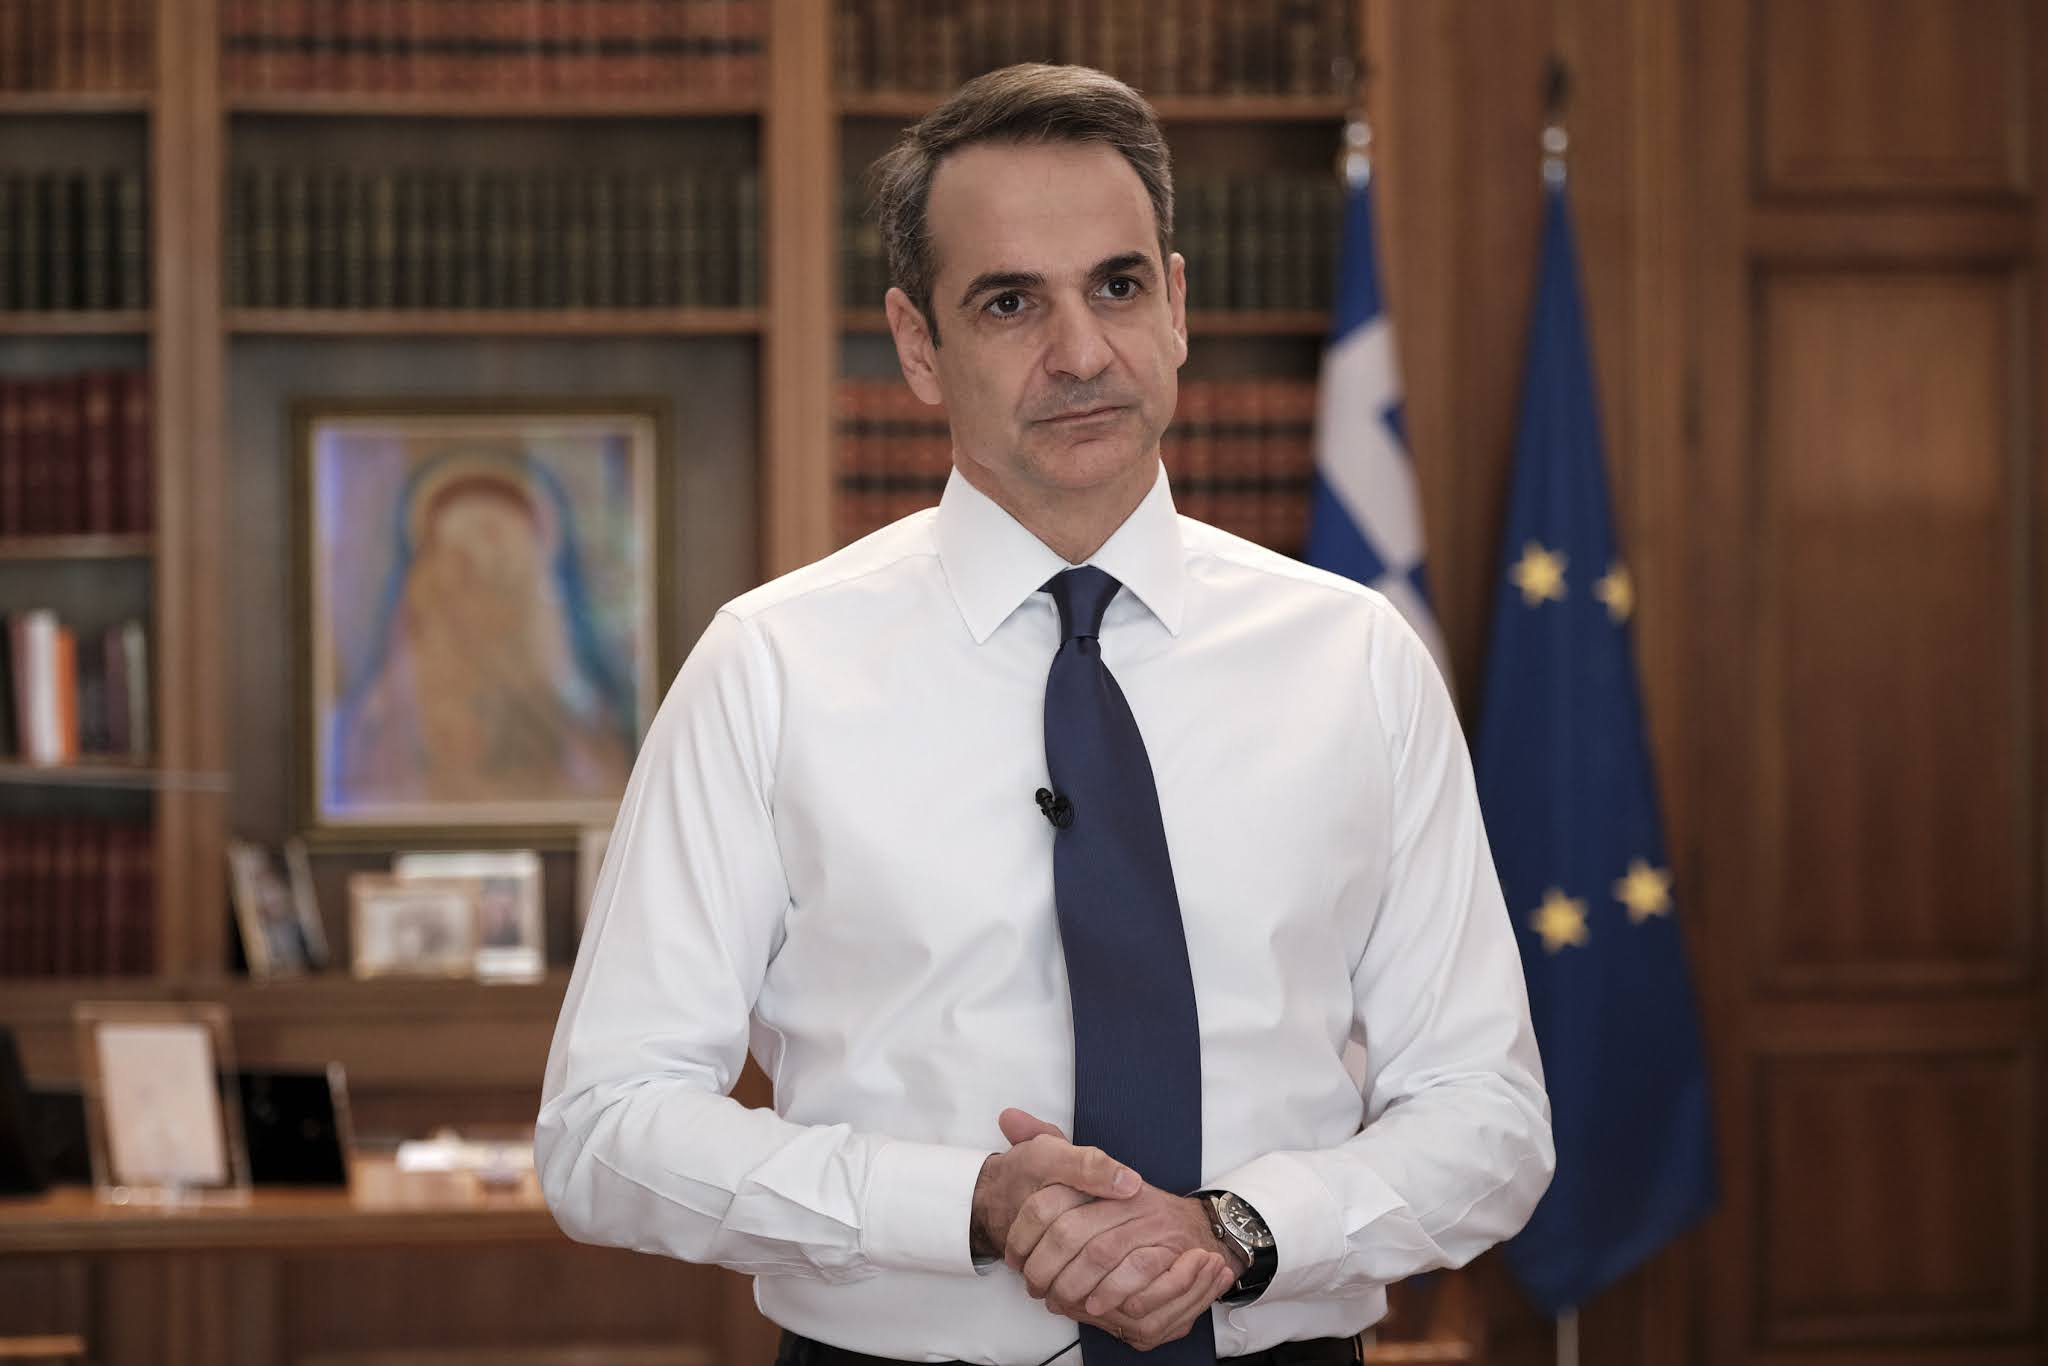 LIVE το μήνυμα του πρωθυπουργού Κυριάκου Μητσοτάκη στους πολίτες - Φωτογραφία 1